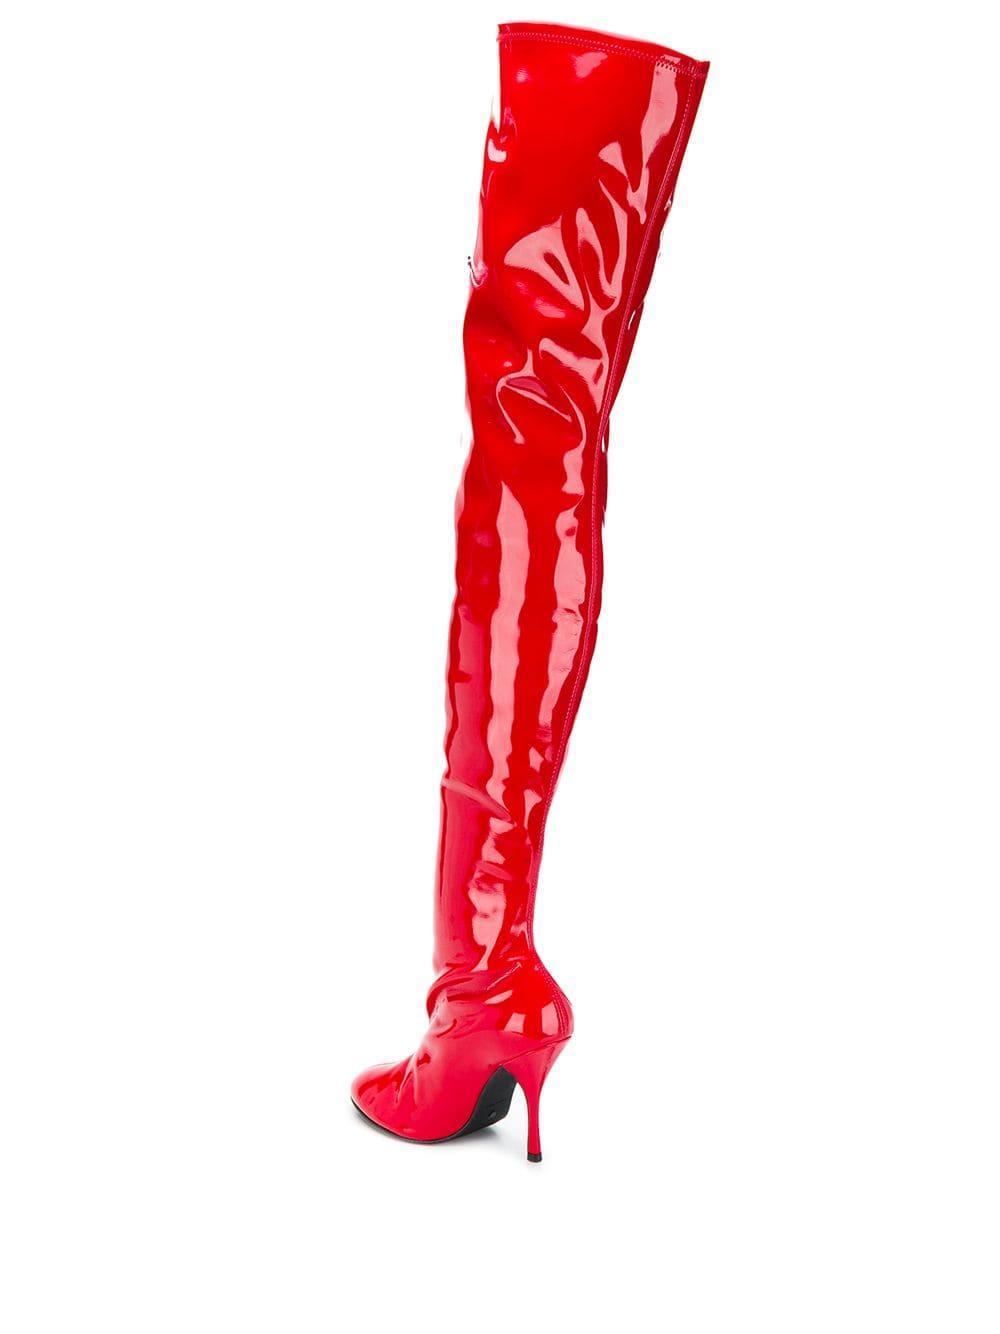 Botas Vienna 100 Stuart Weitzman de color Rojo